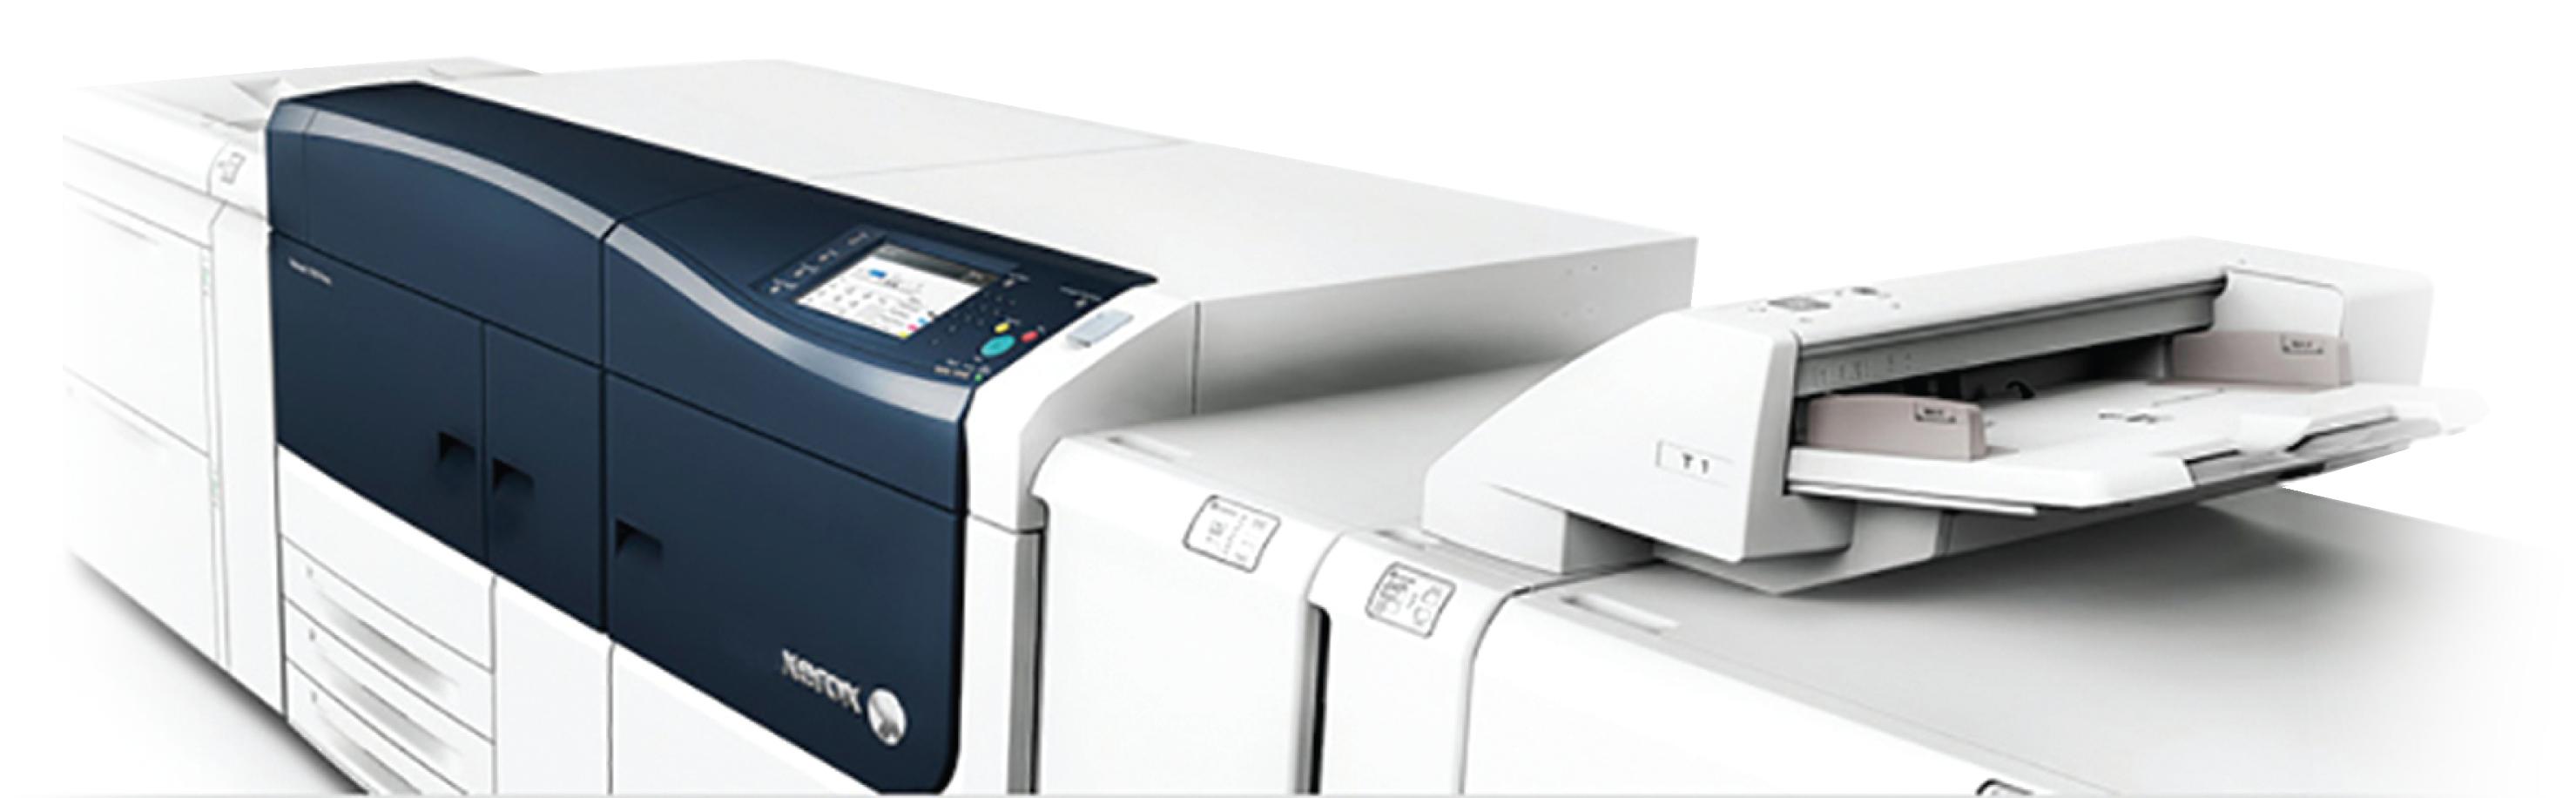 W&G Baird Digital Print Services